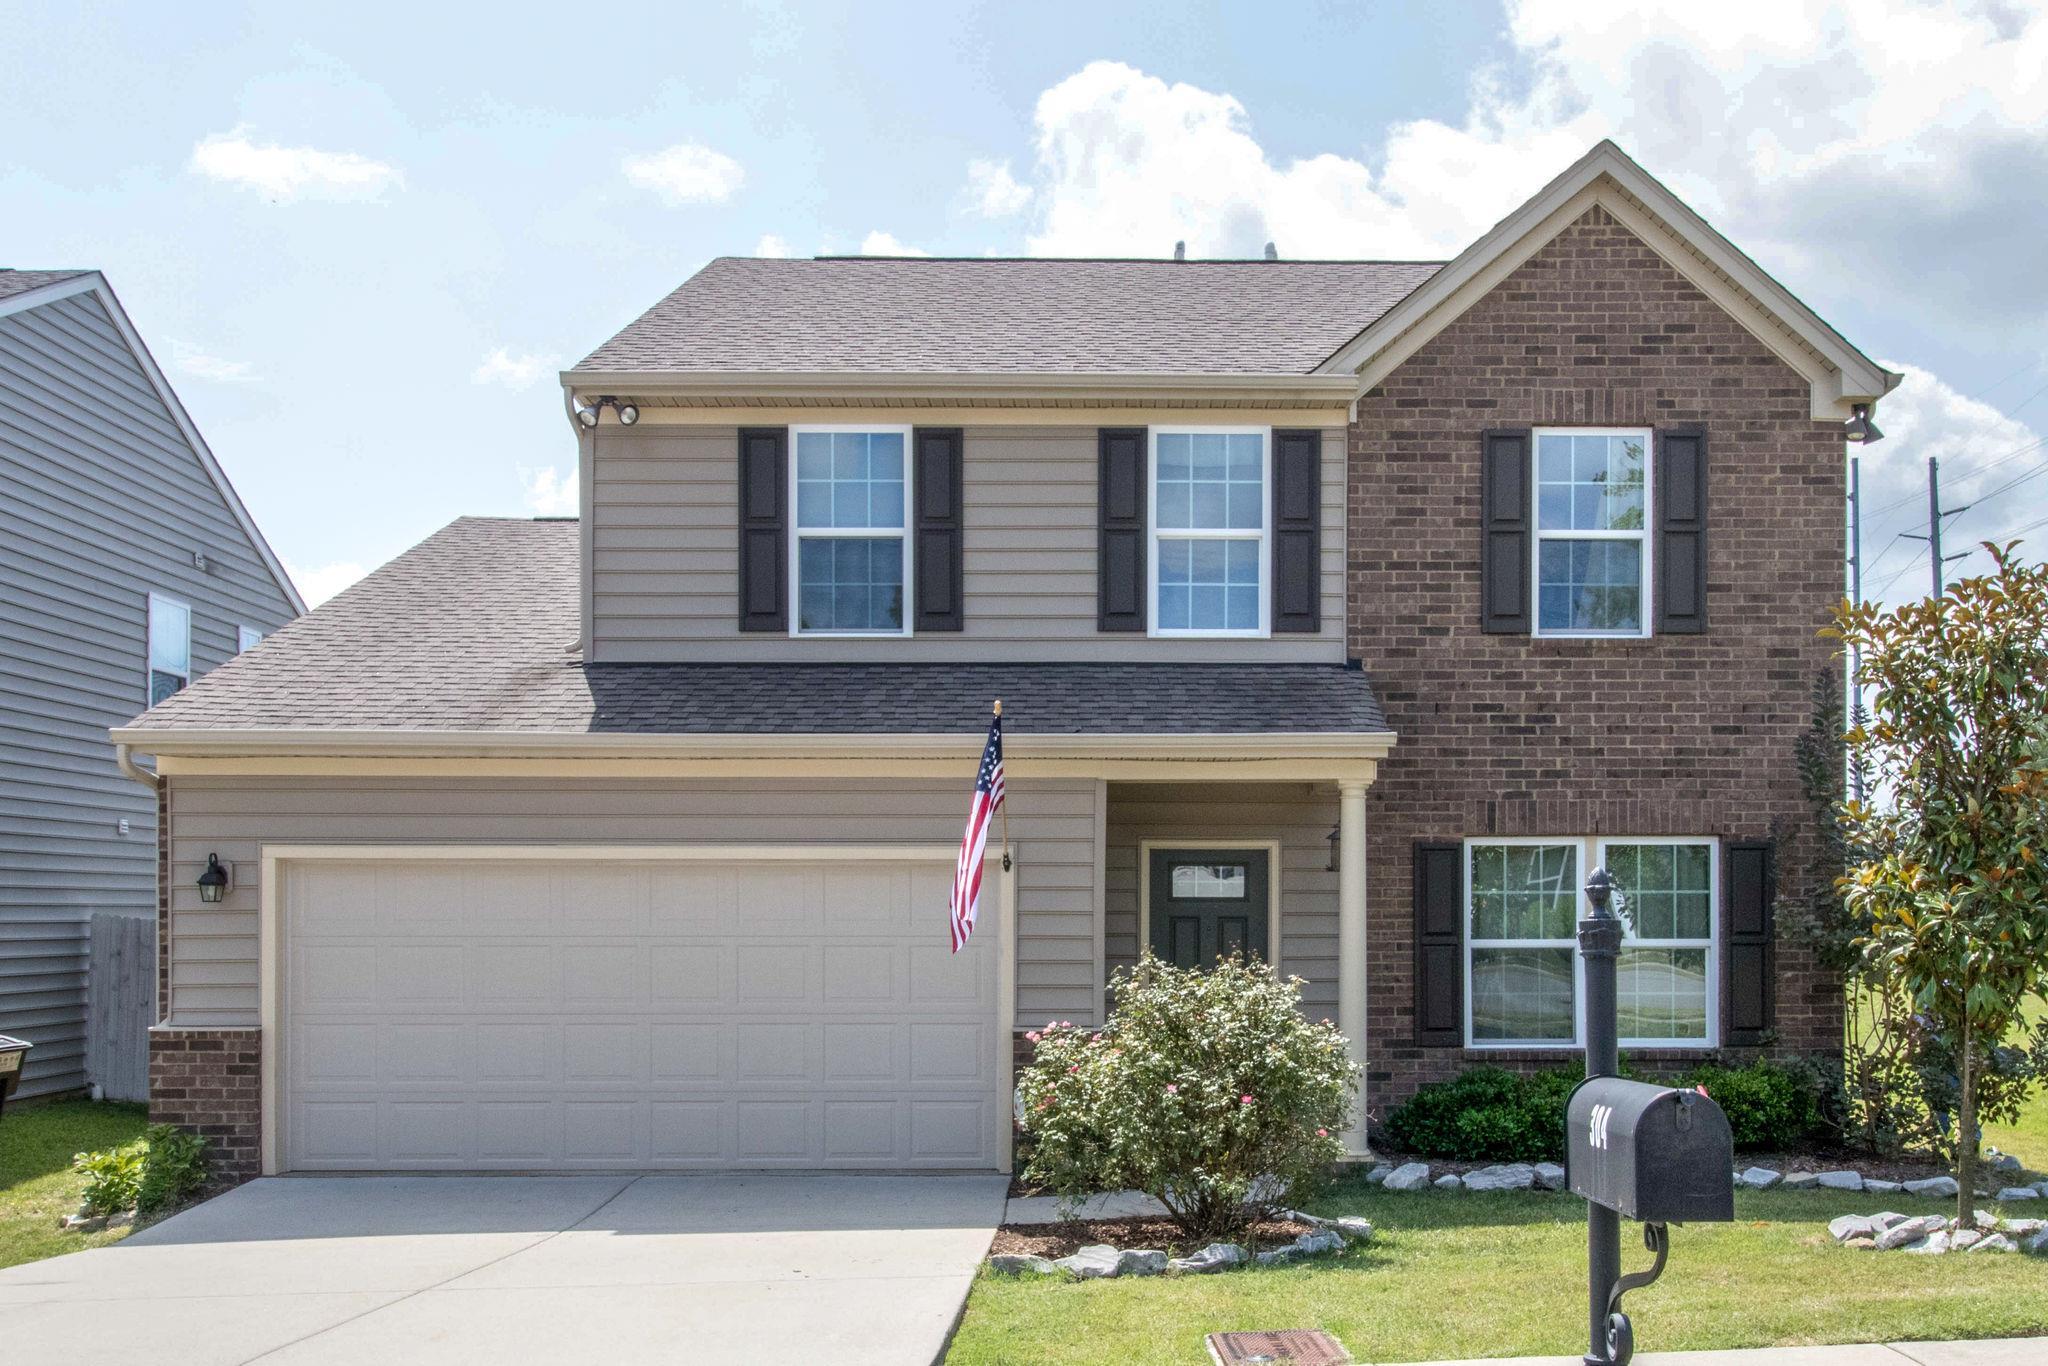 304 Parmley Ln, Nashville, TN 37207 - Nashville, TN real estate listing